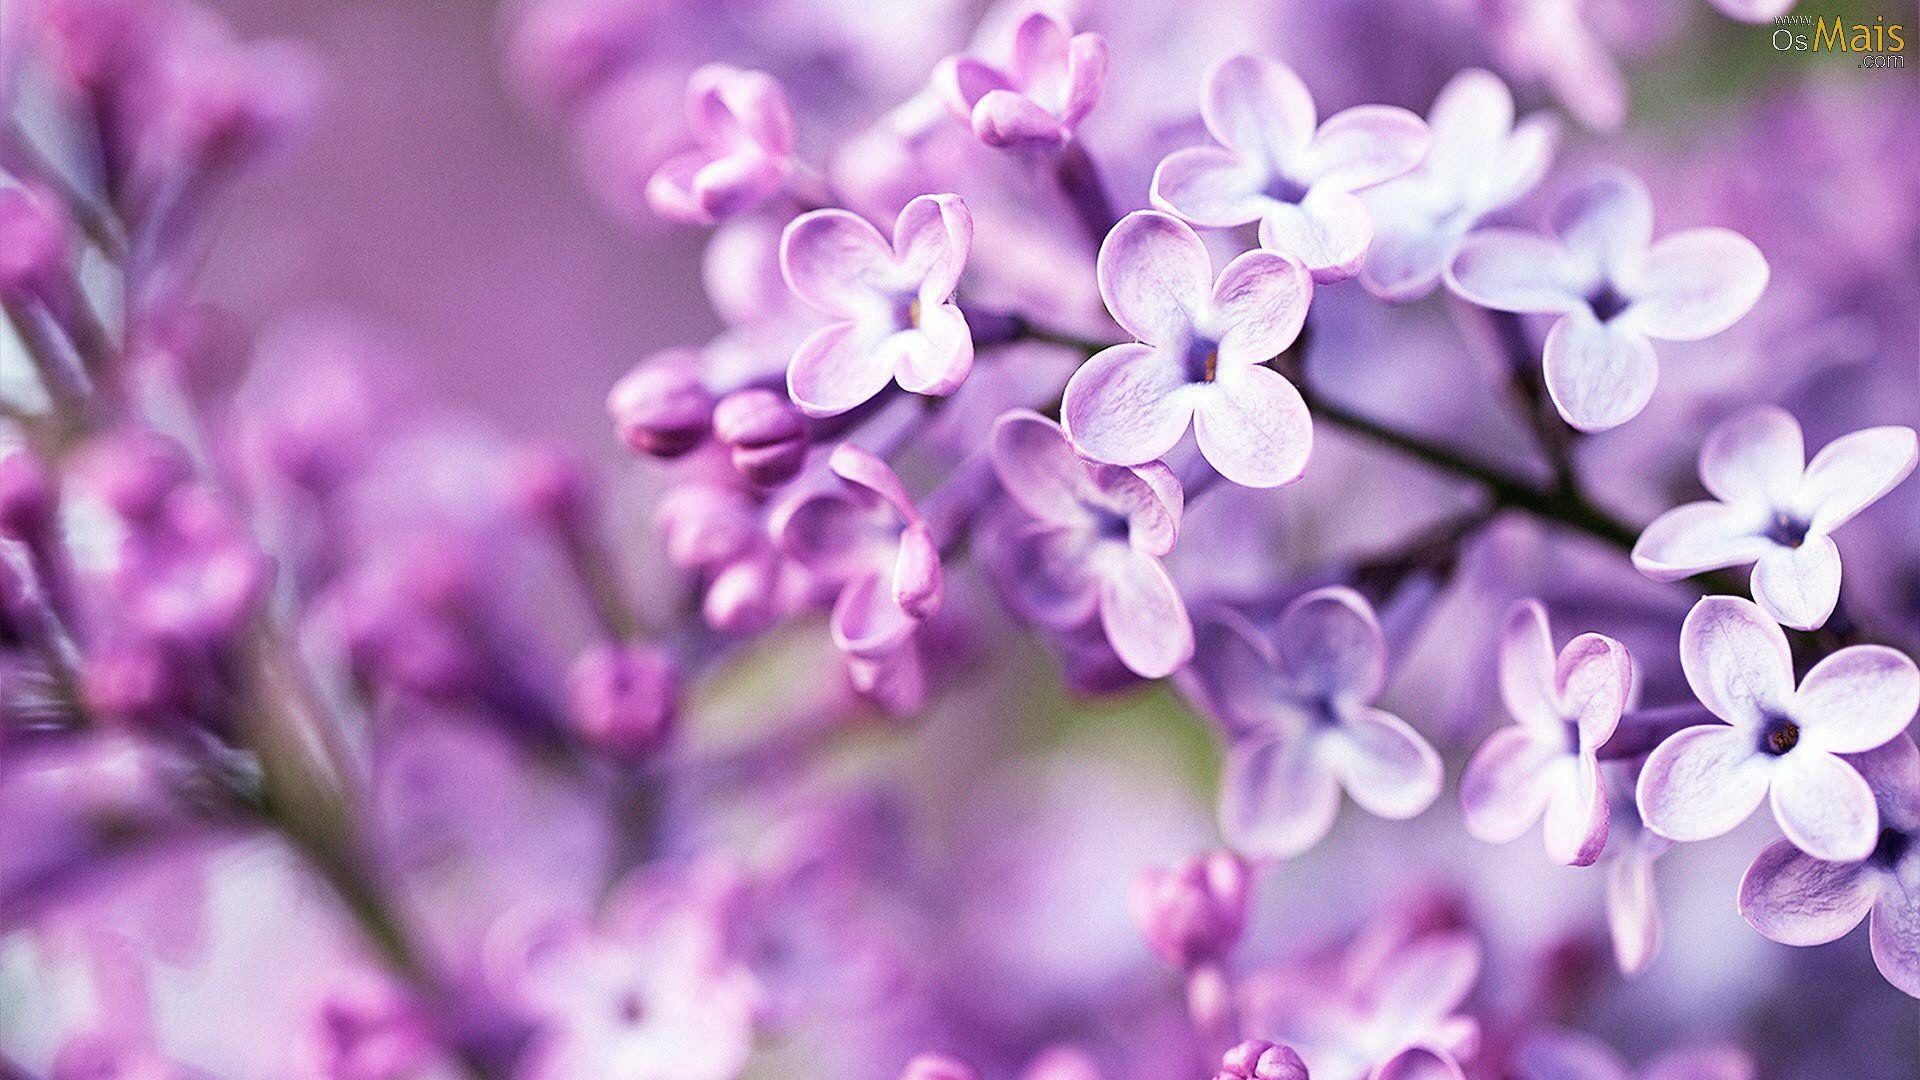 Purple Flowers Wallpaper In 2020 Spring Flowers Wallpaper Purple Flowers Wallpaper Purple Flowers